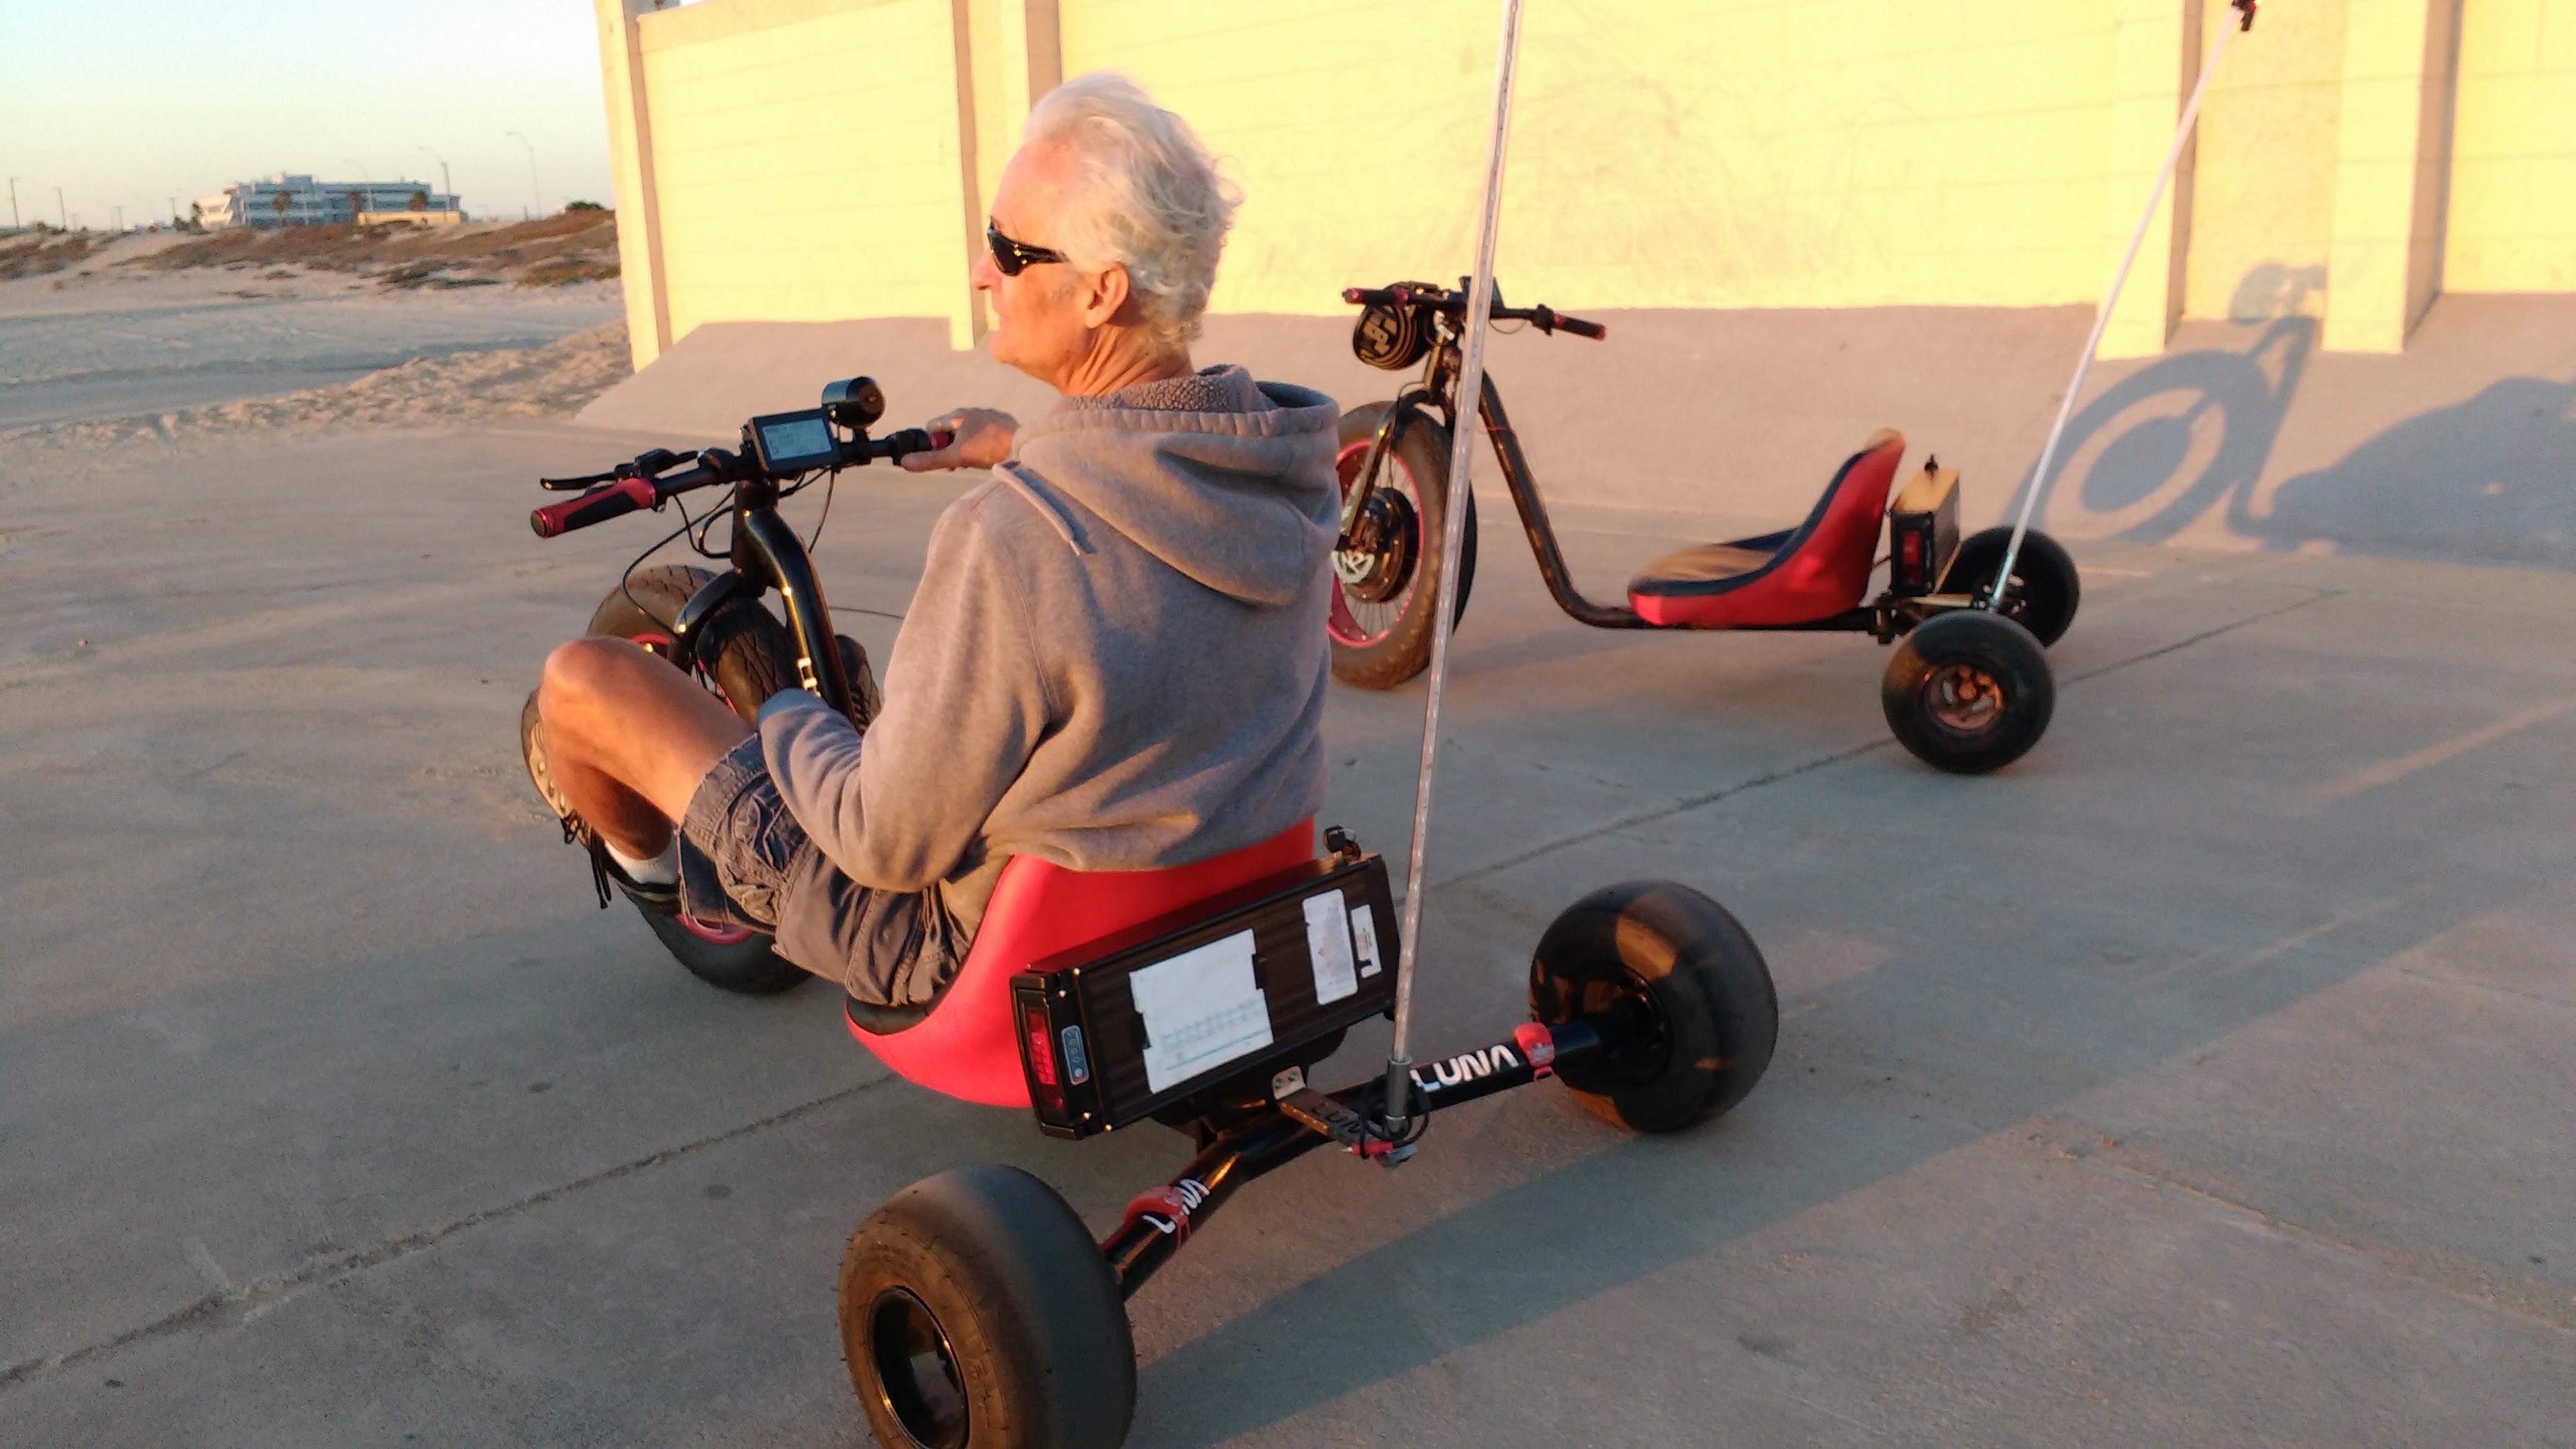 I Dream Of Drifting Lunacycle S Totally Insane 52v 20ah Drift Fat Trike Electricbike Blog Com